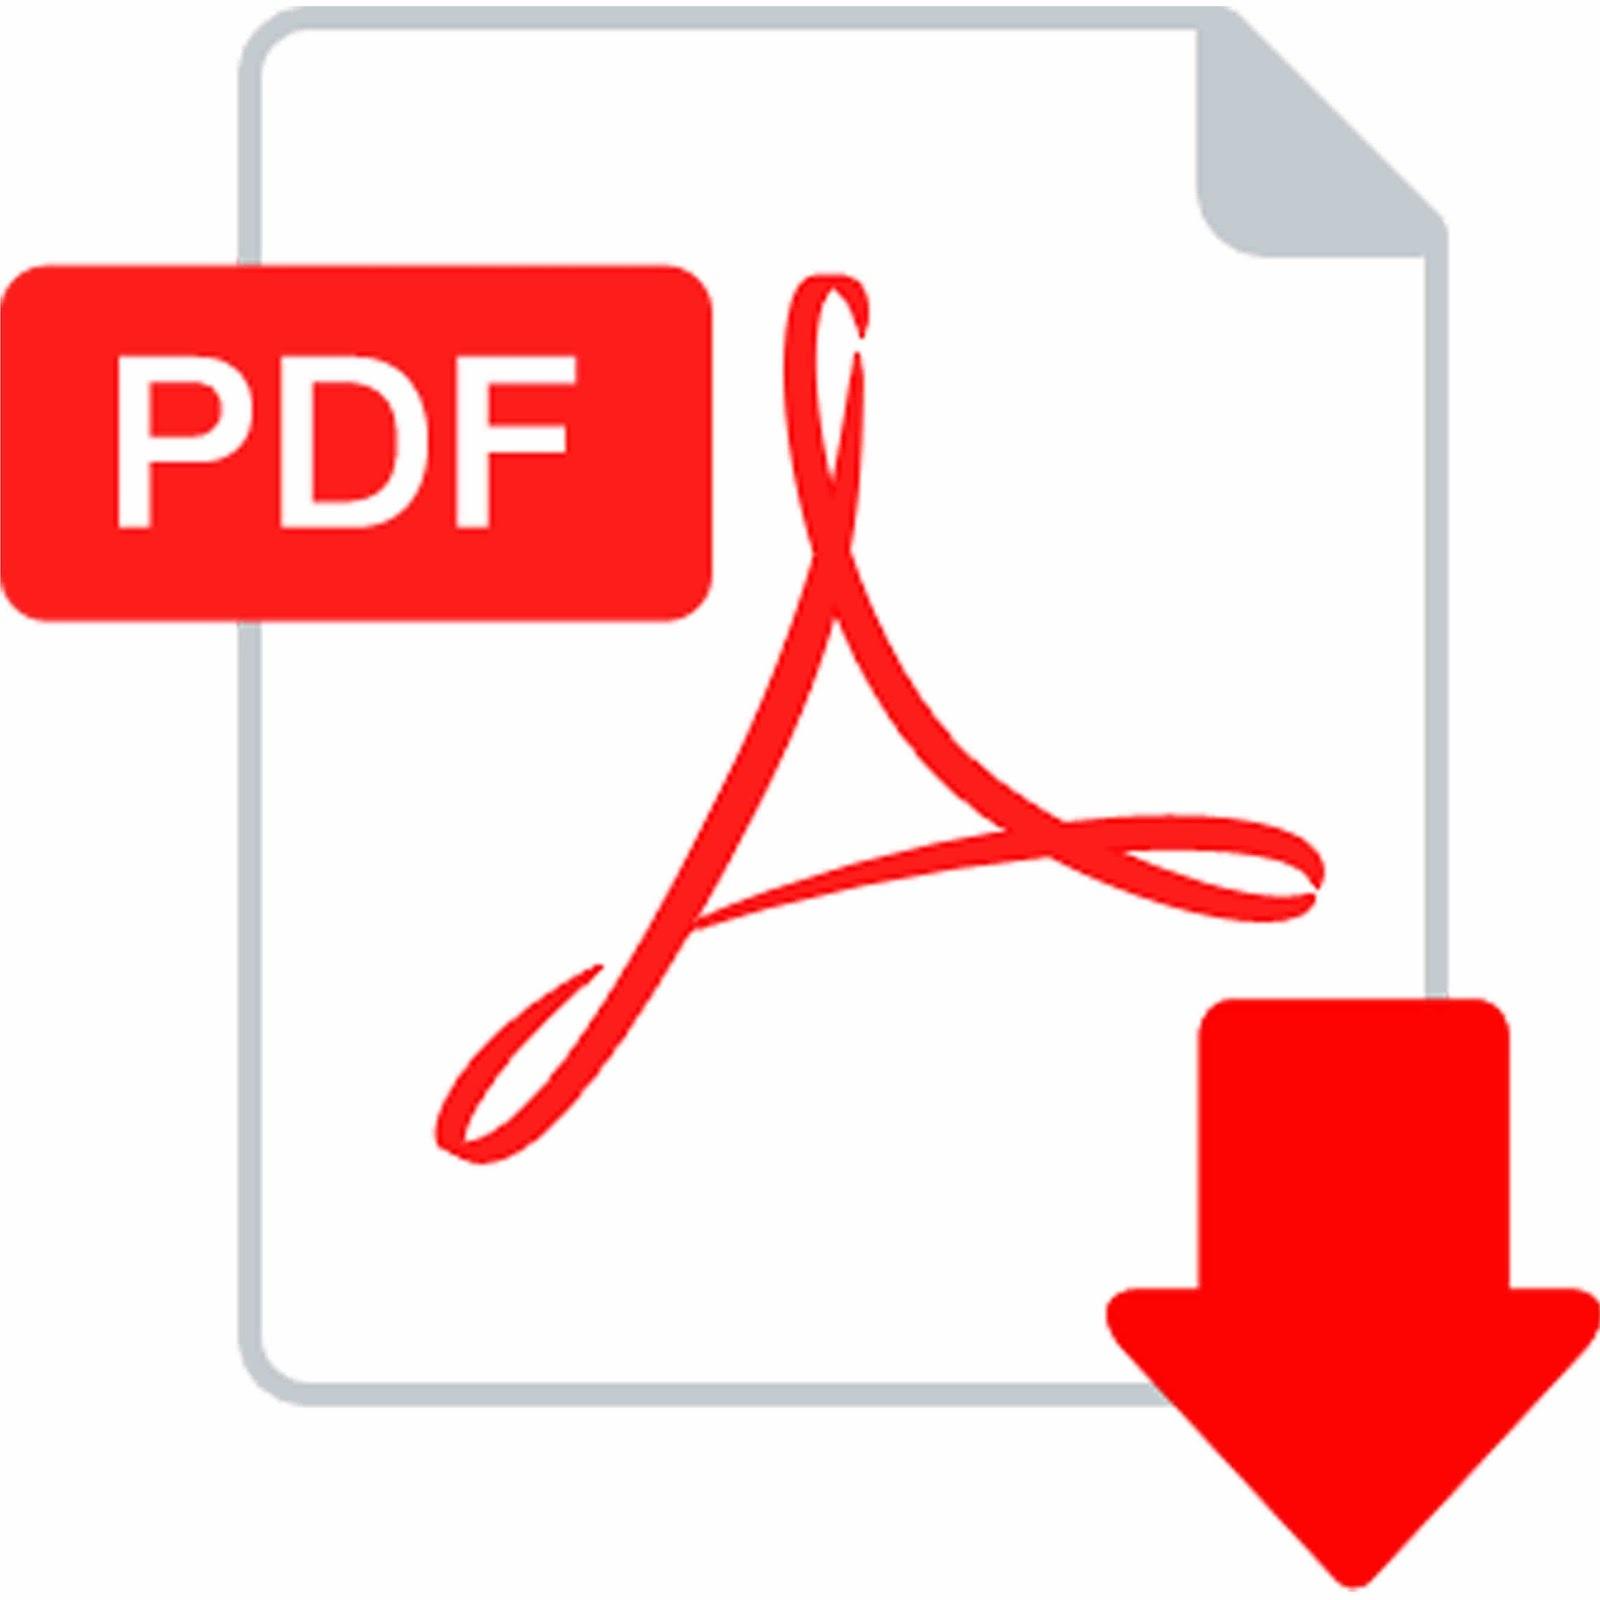 Padrão PDF